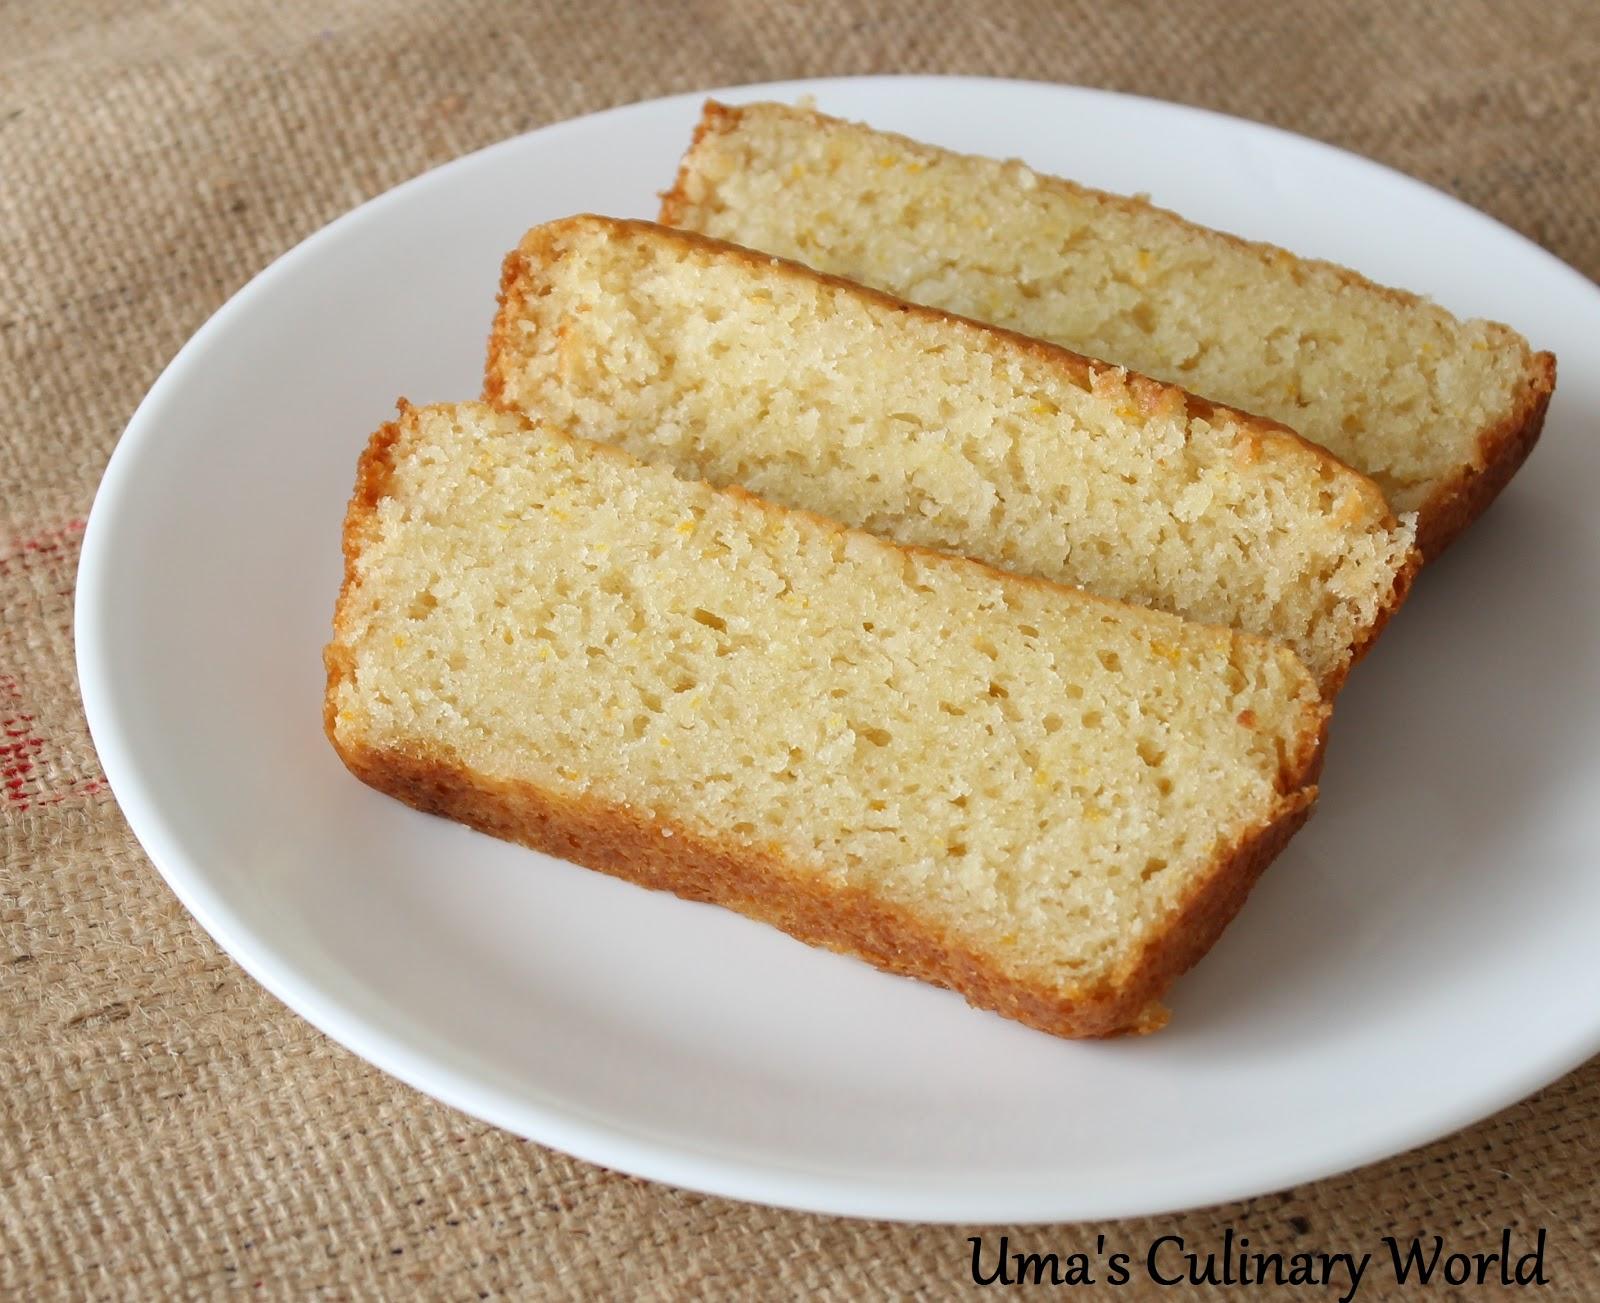 Sponge Cake With Oil And Yogurt